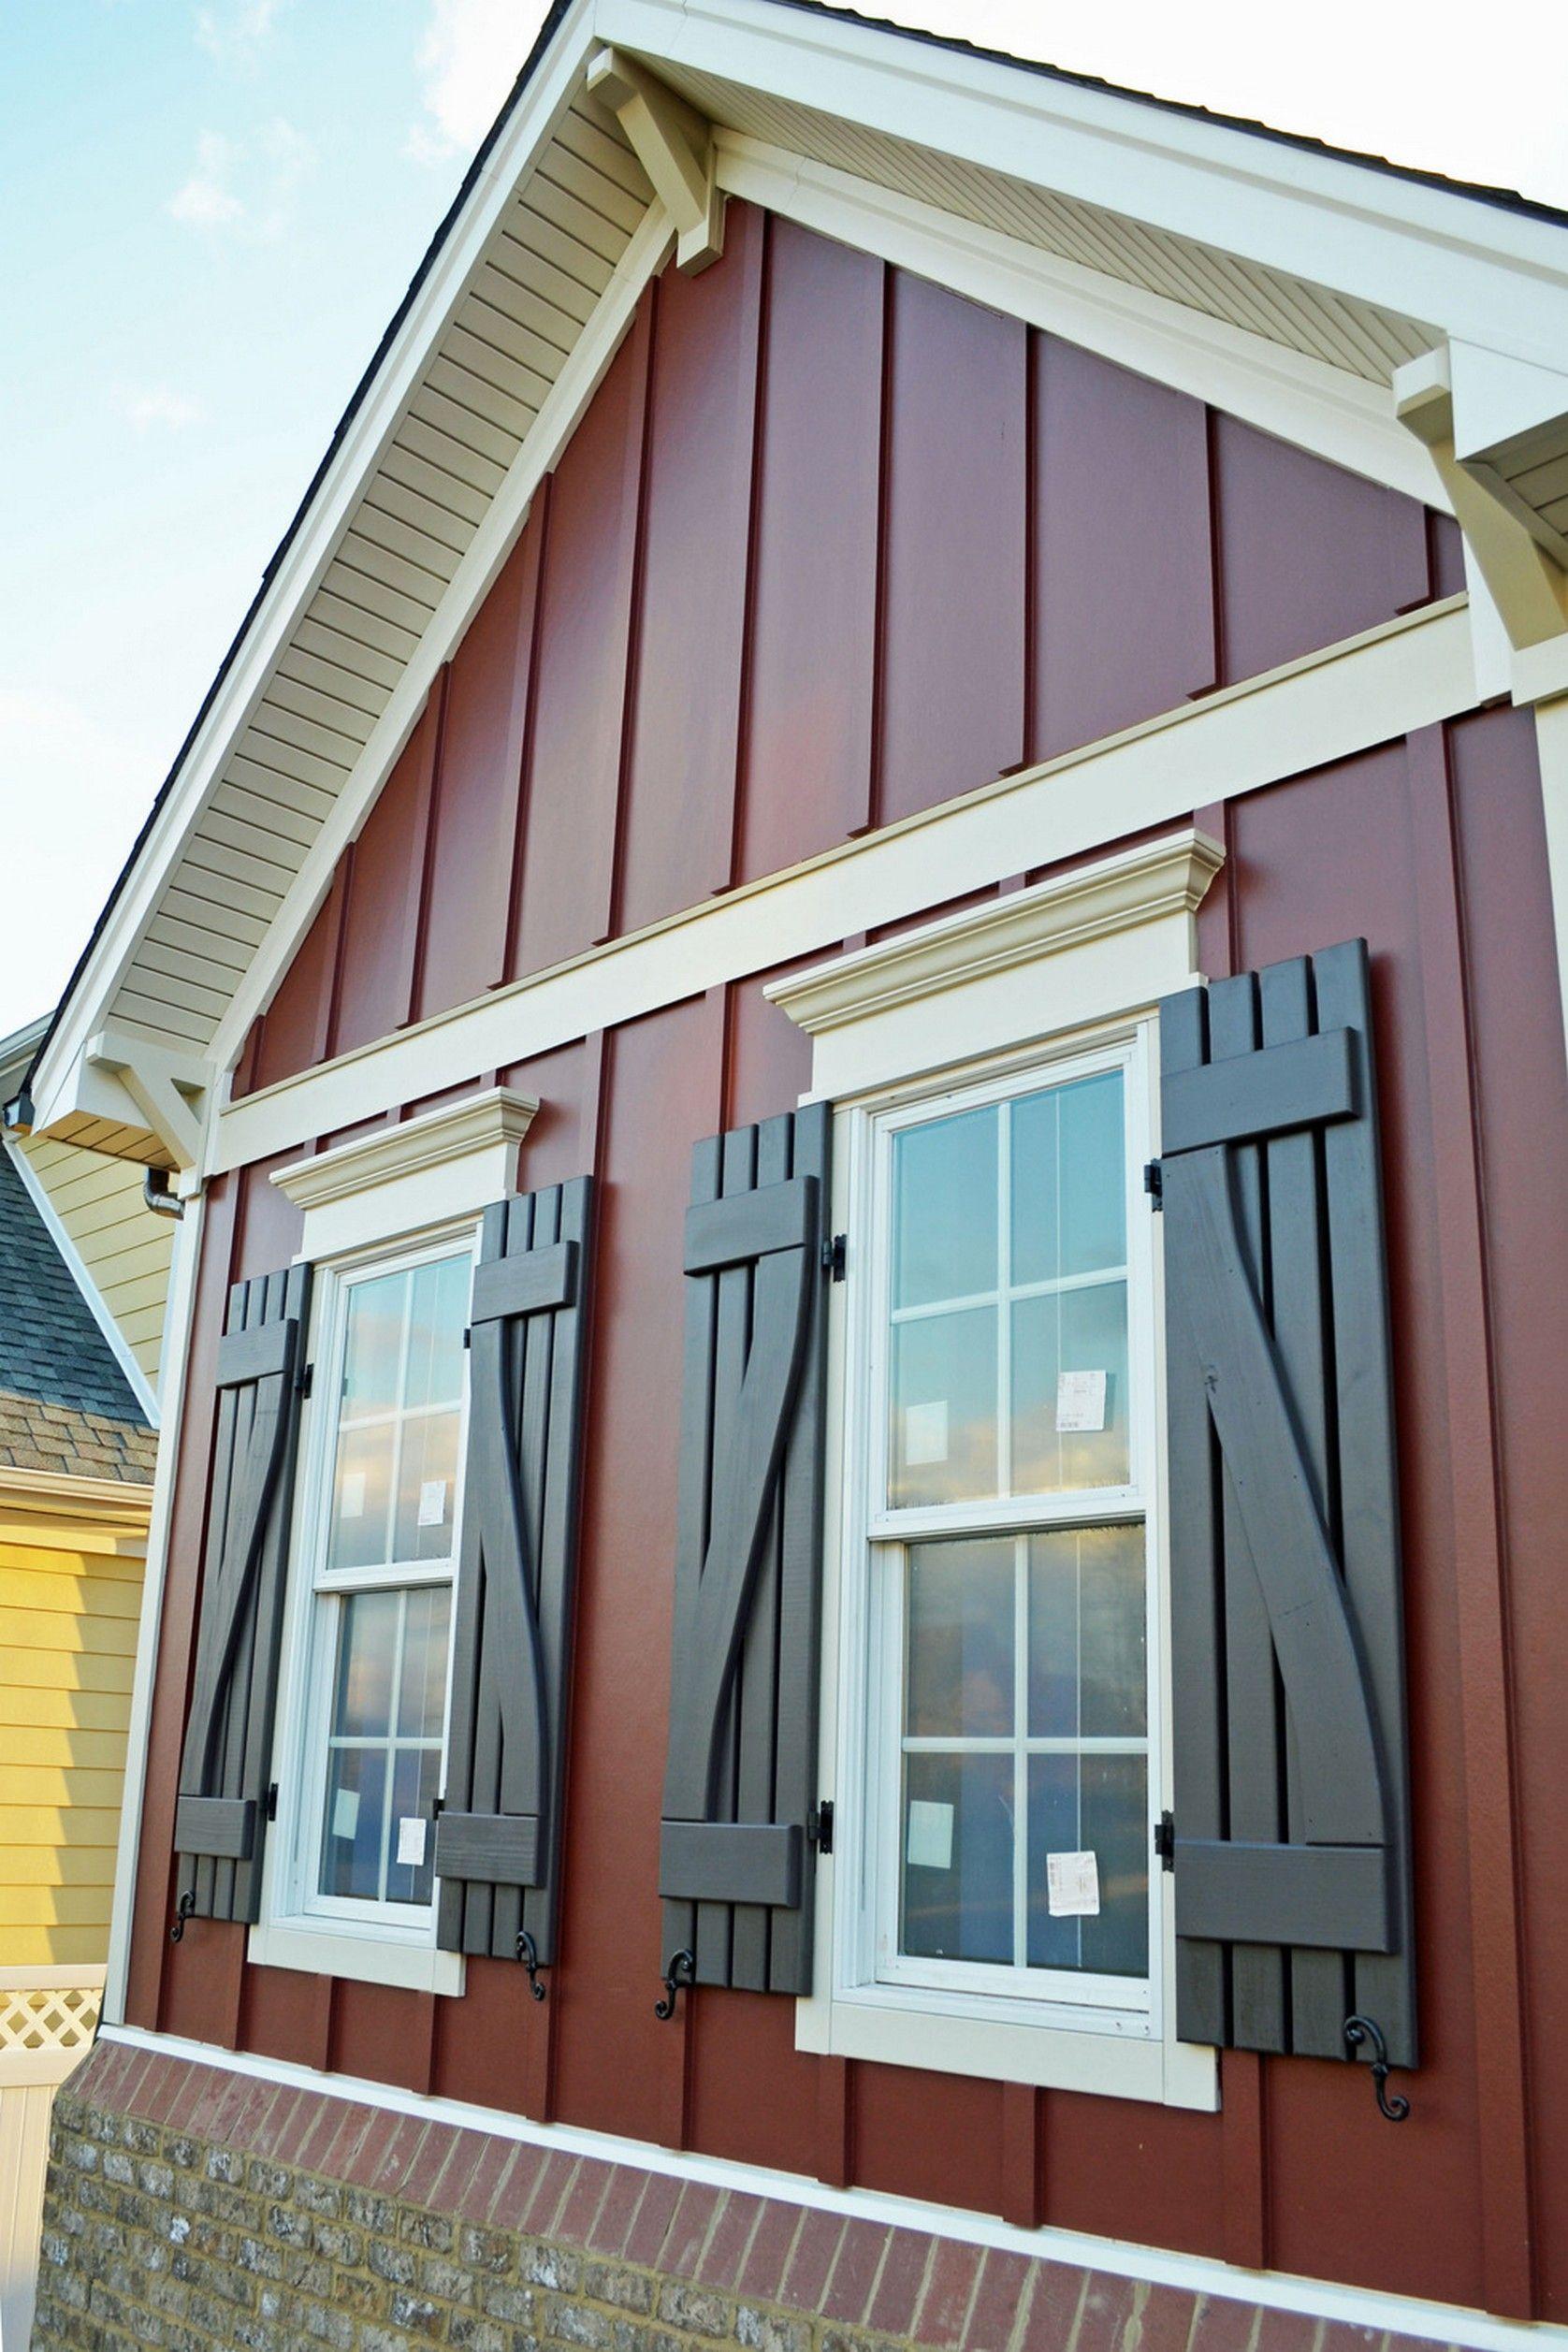 Home Exterior Design 5 Ideas 31 Pictures: I Love This Barn House / Barndominium Ideas. Really! #Barndominium #BarnHome #BarnHouse Tags: B